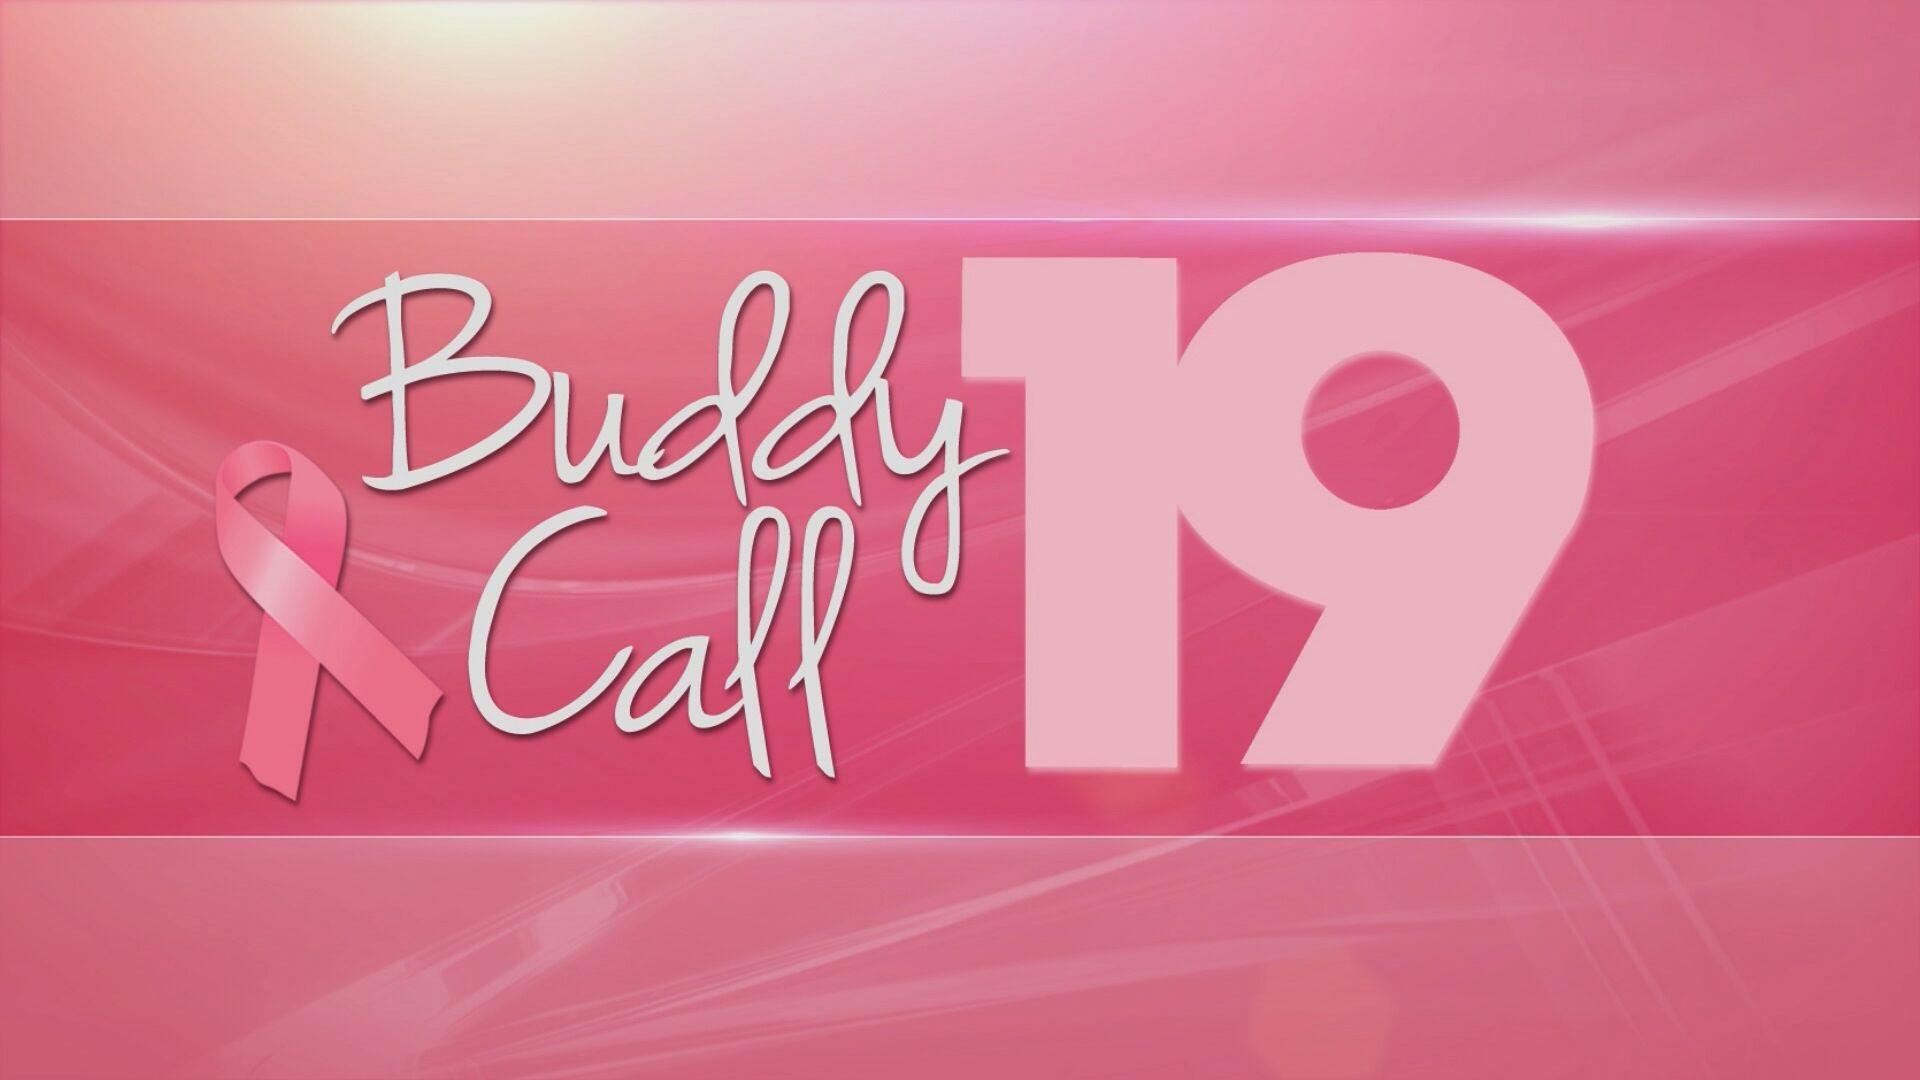 Buddy Call 19